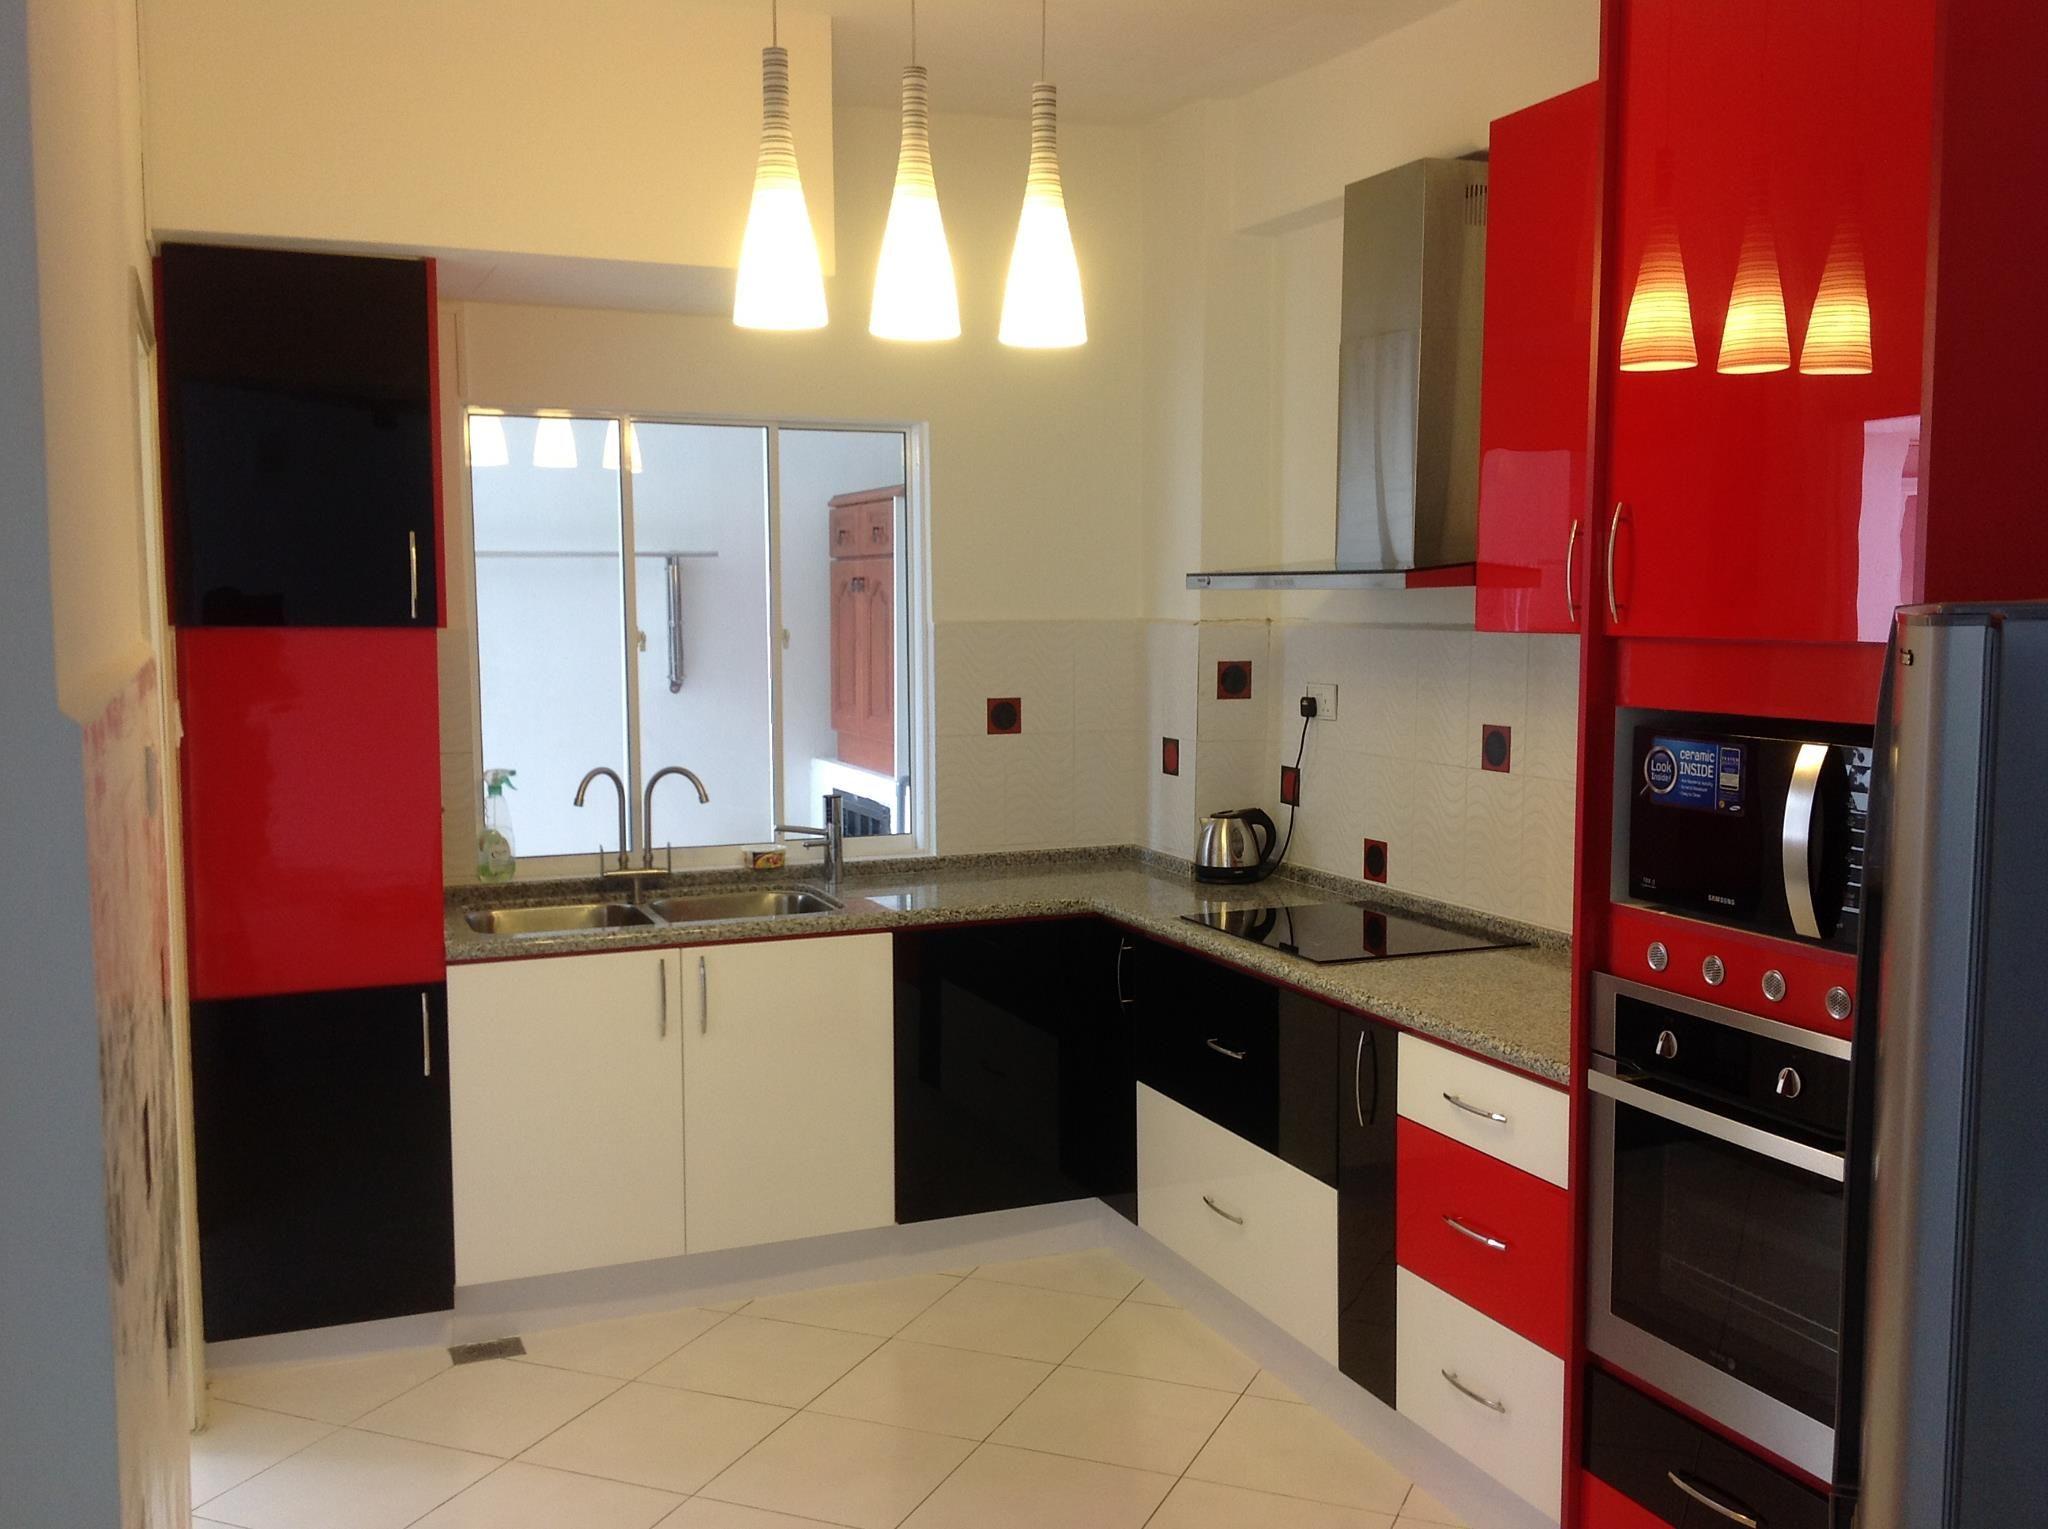 Kitchen at Bukit Antarabangsa Ampang. Red, black